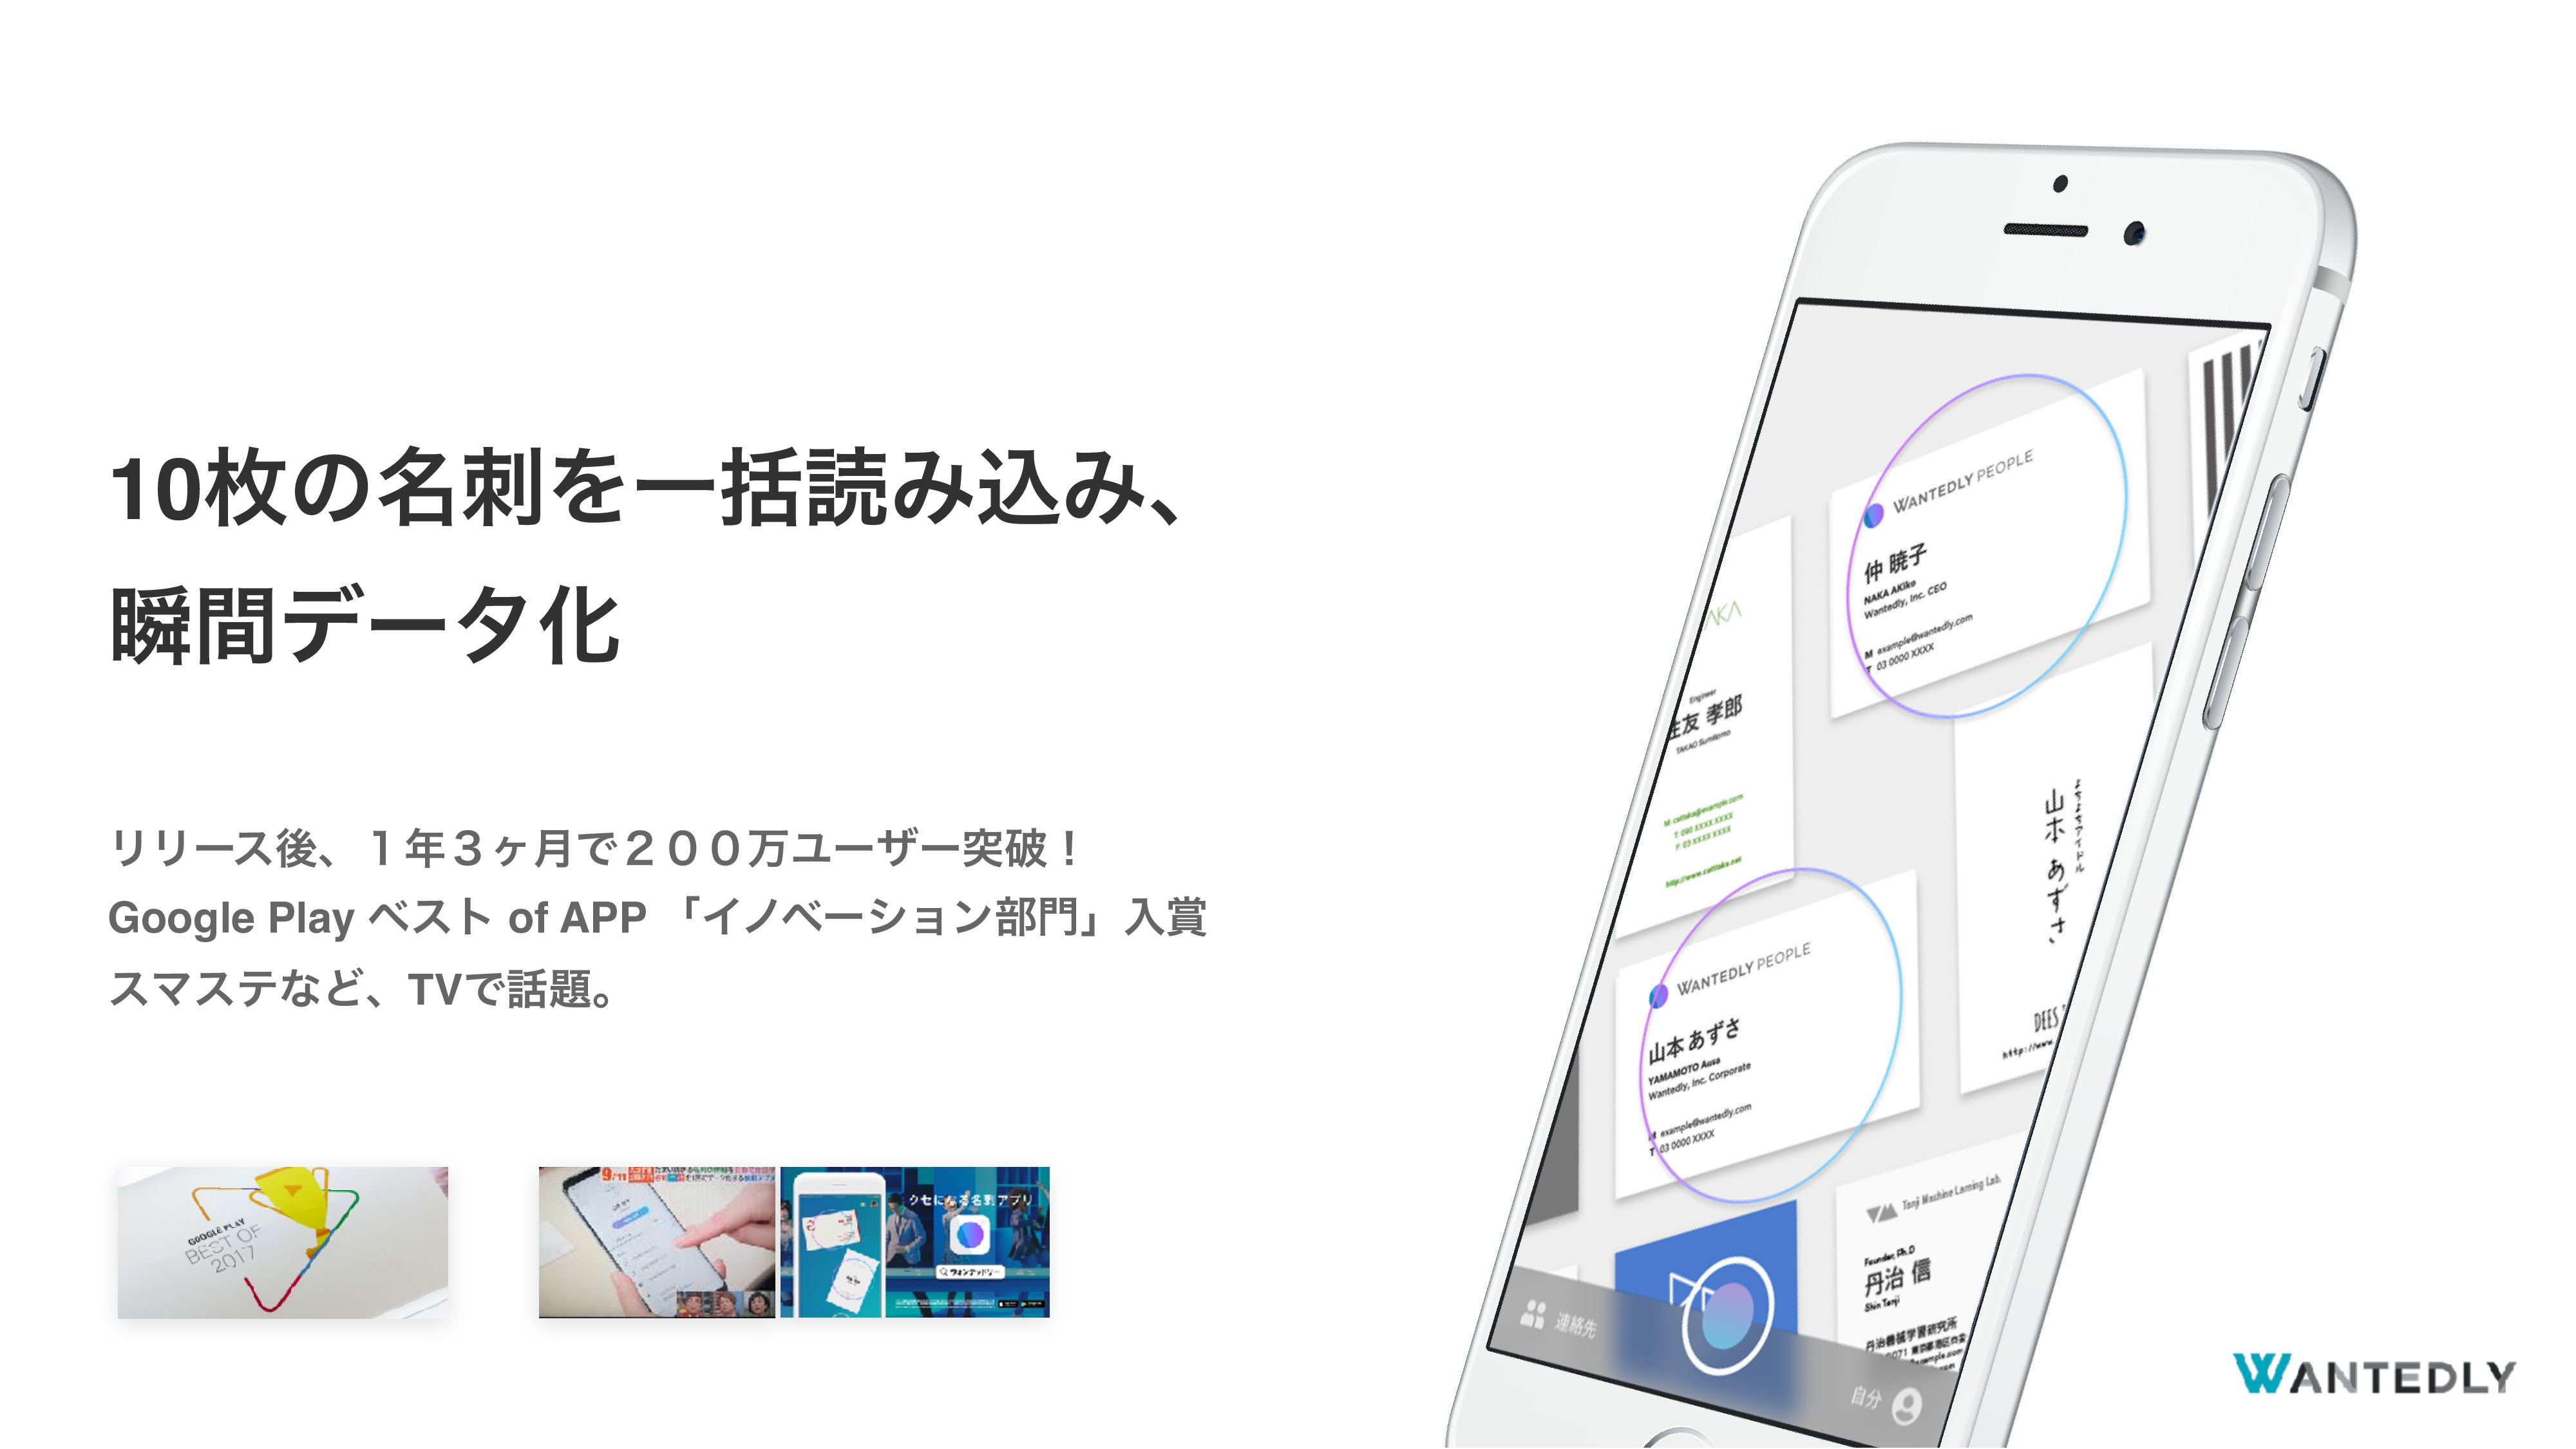 ϦϦʔεޙɺ̍̏ϲ݄Ͱ̎̌̌ສϢʔβʔಥഁʂ Google Play ϕετ of APP ...